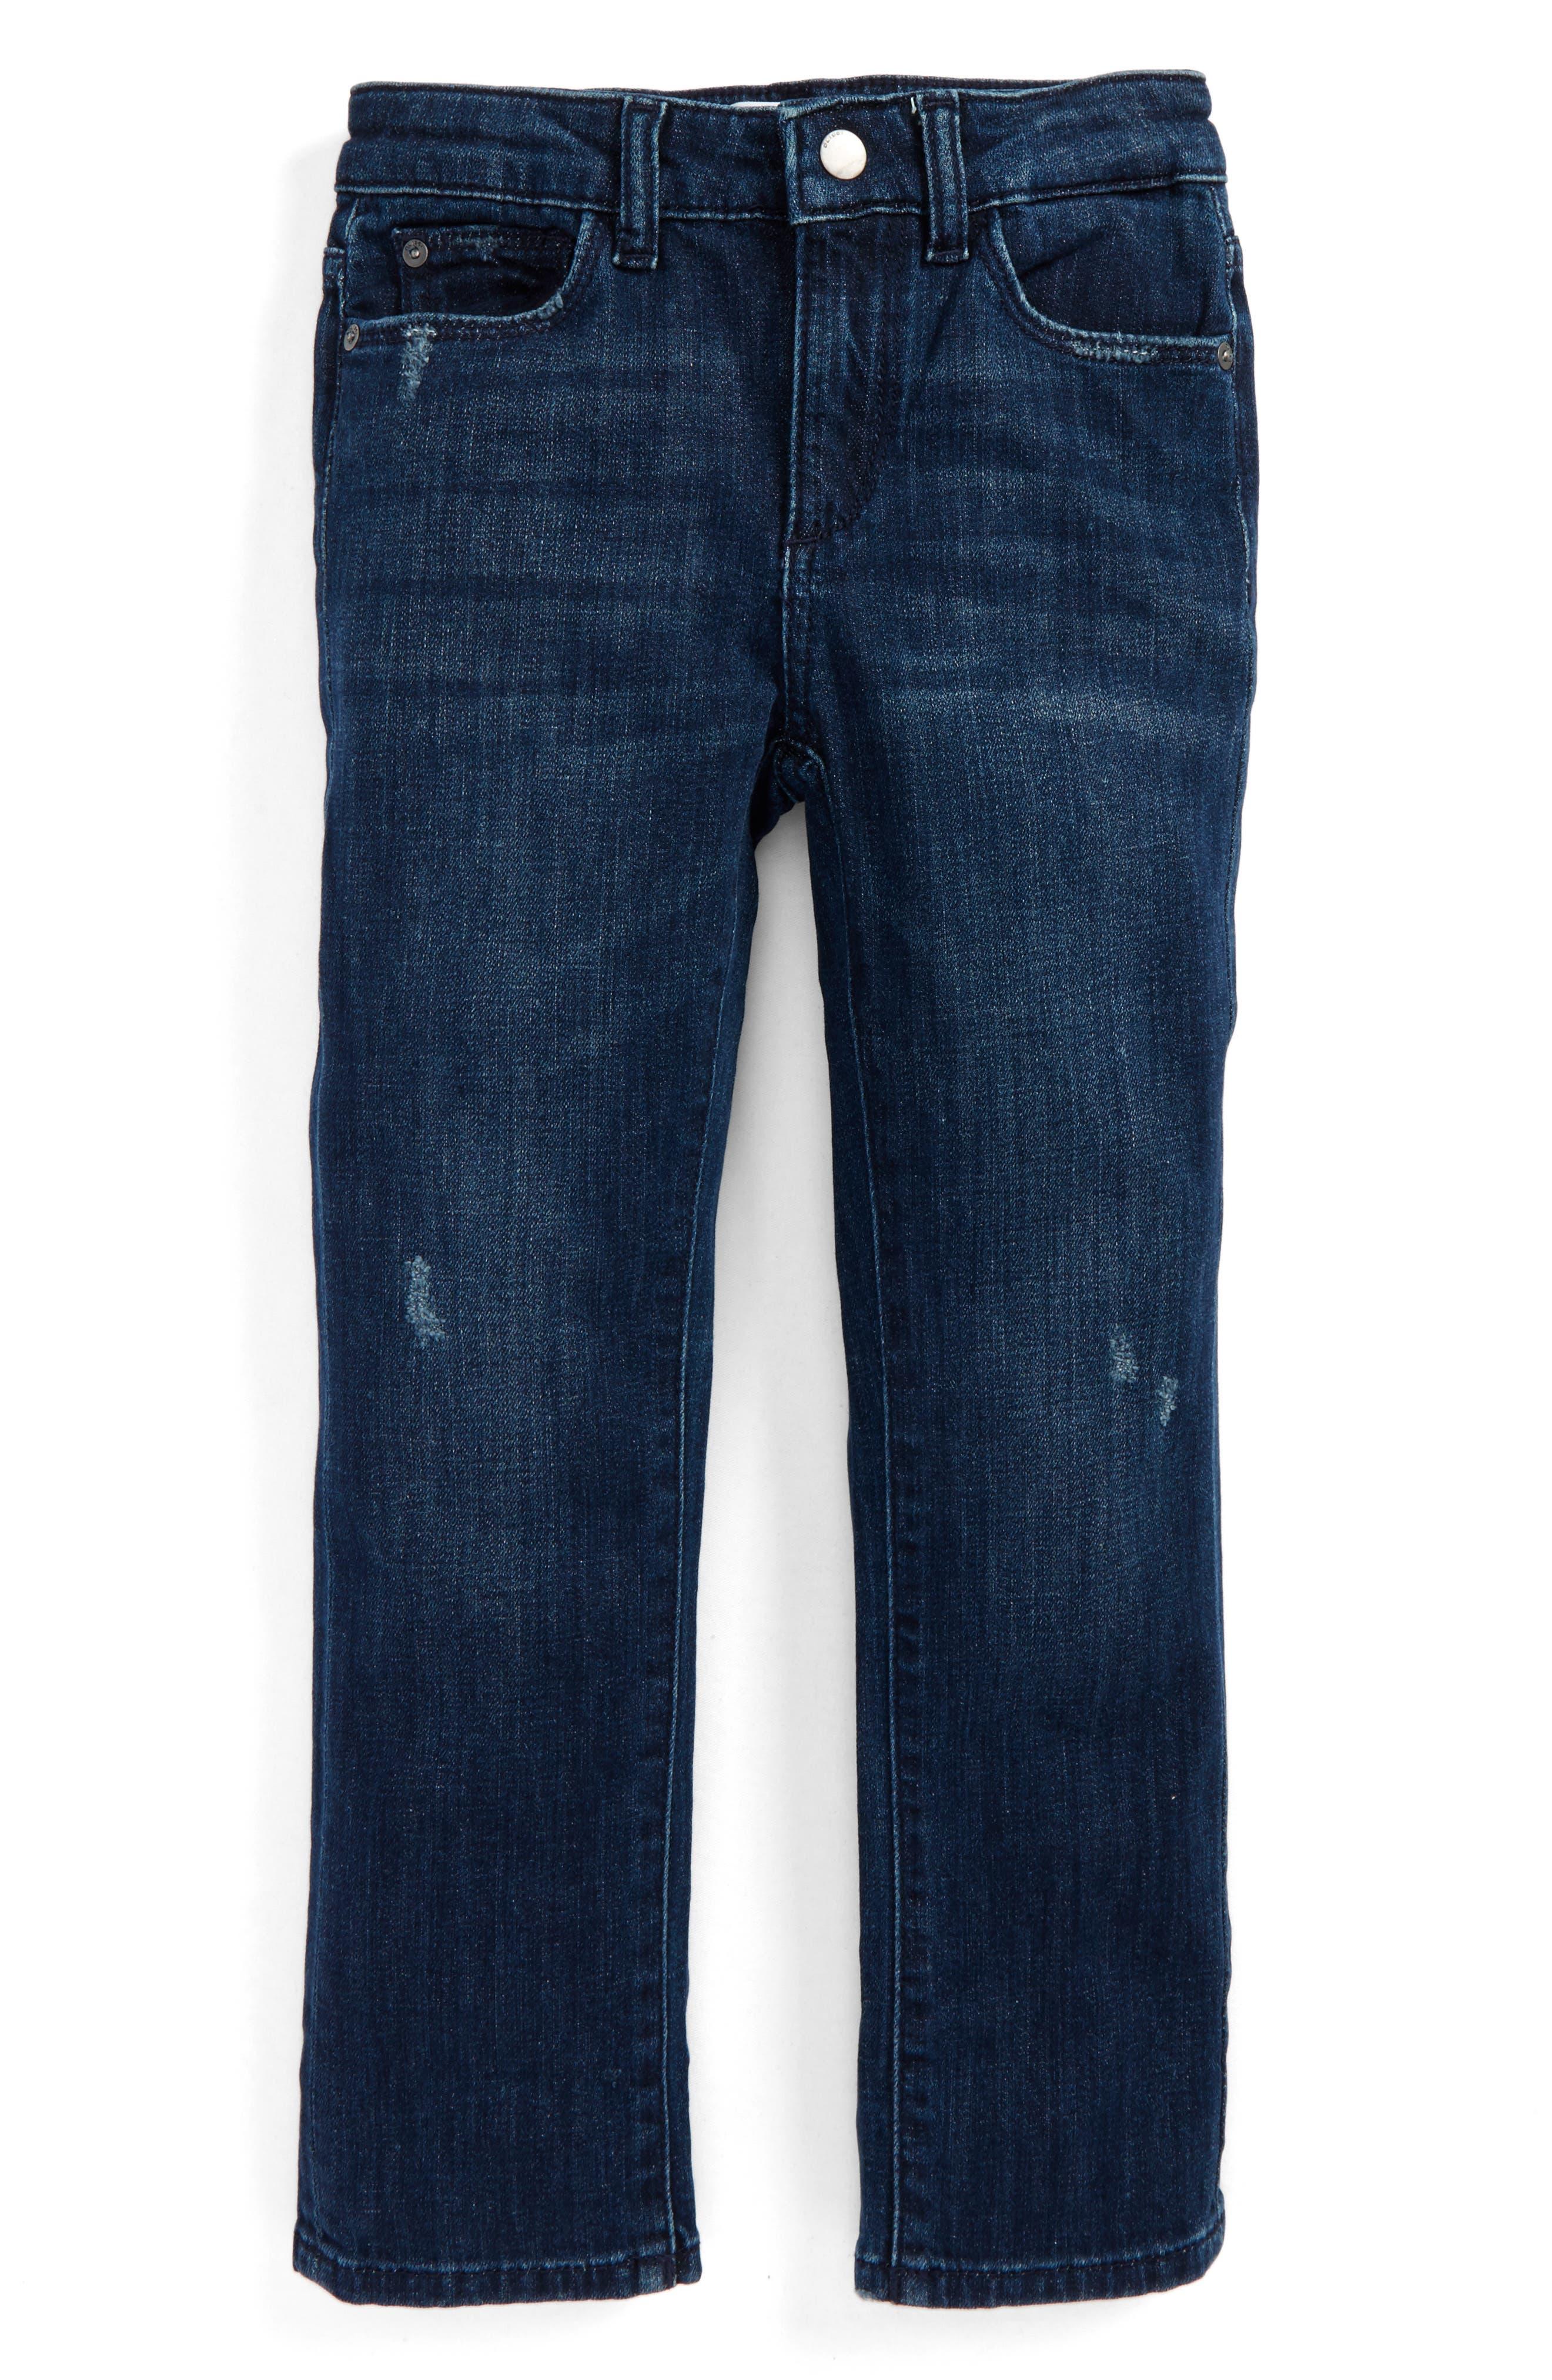 Brady Slim Fit Jeans,                         Main,                         color, Lodi